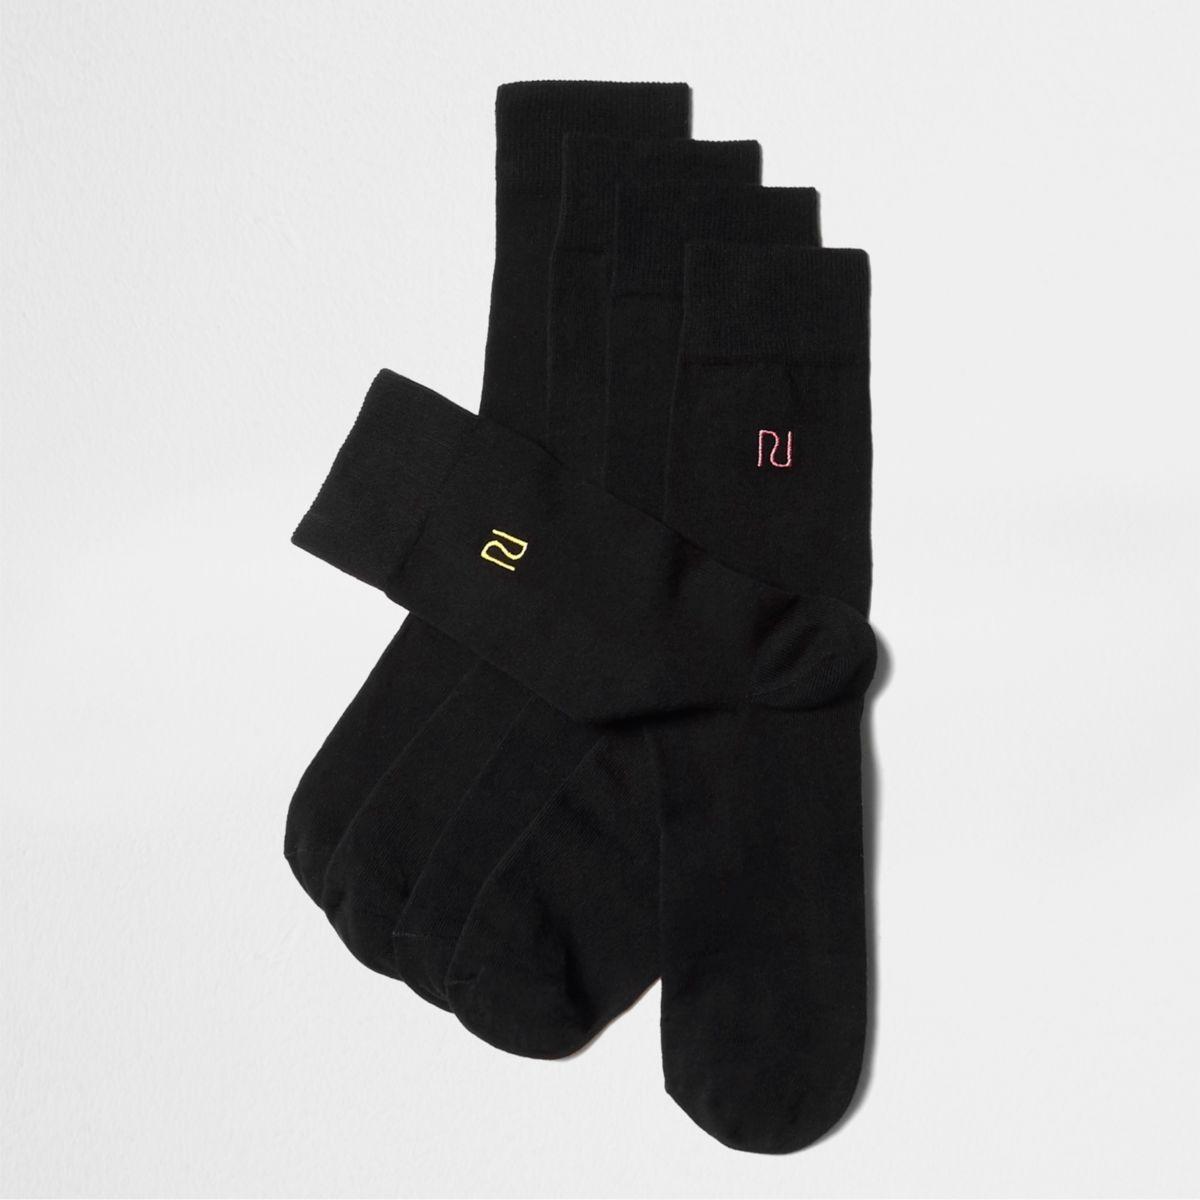 Black multicolour 'RI' embroidered socks pack